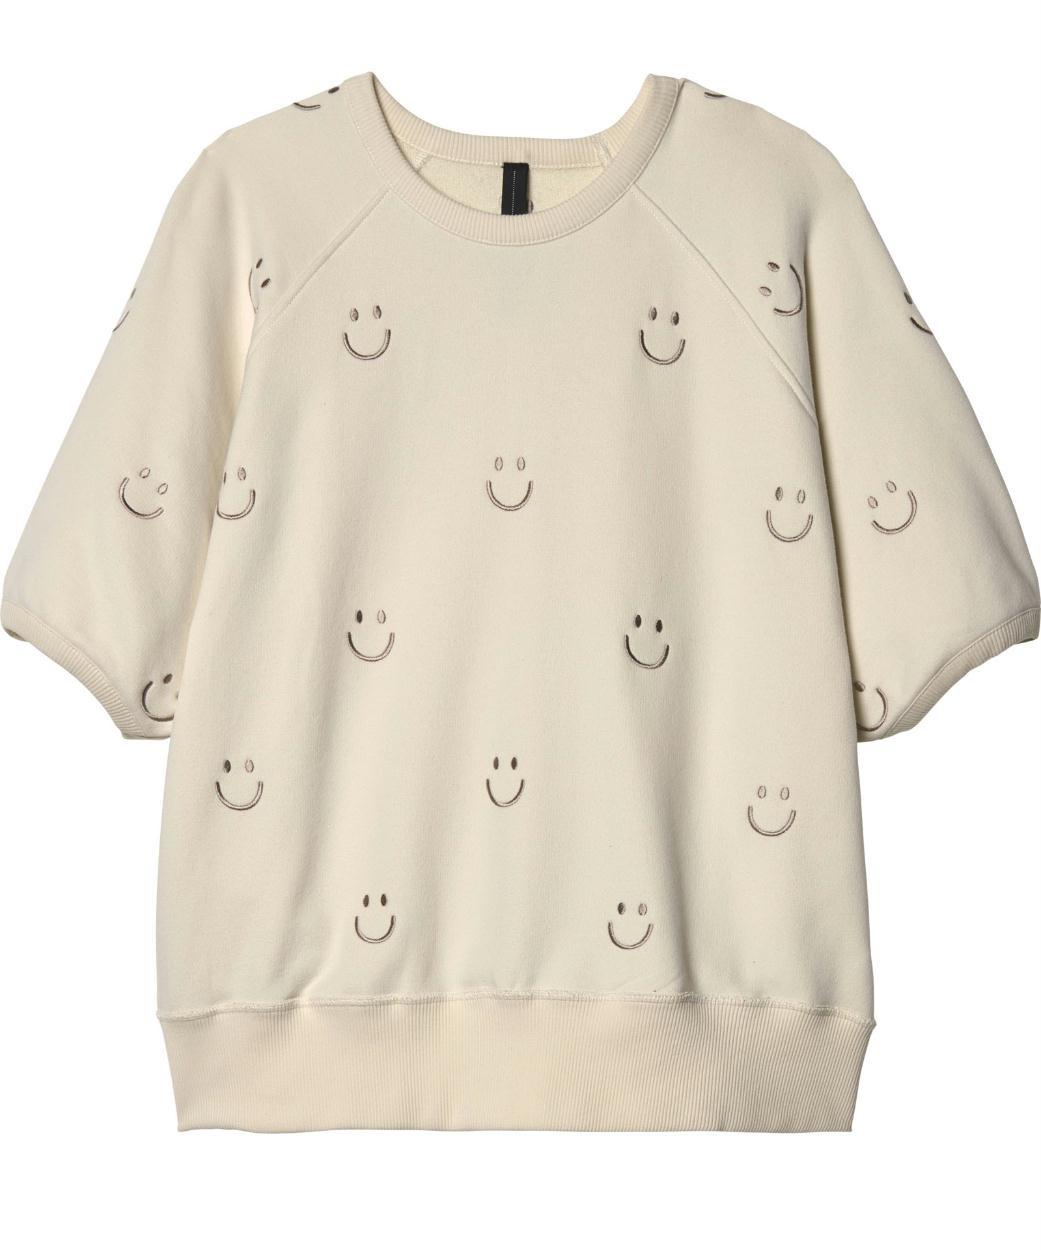 10Days Ecru Happy Sweater 20.809.9103